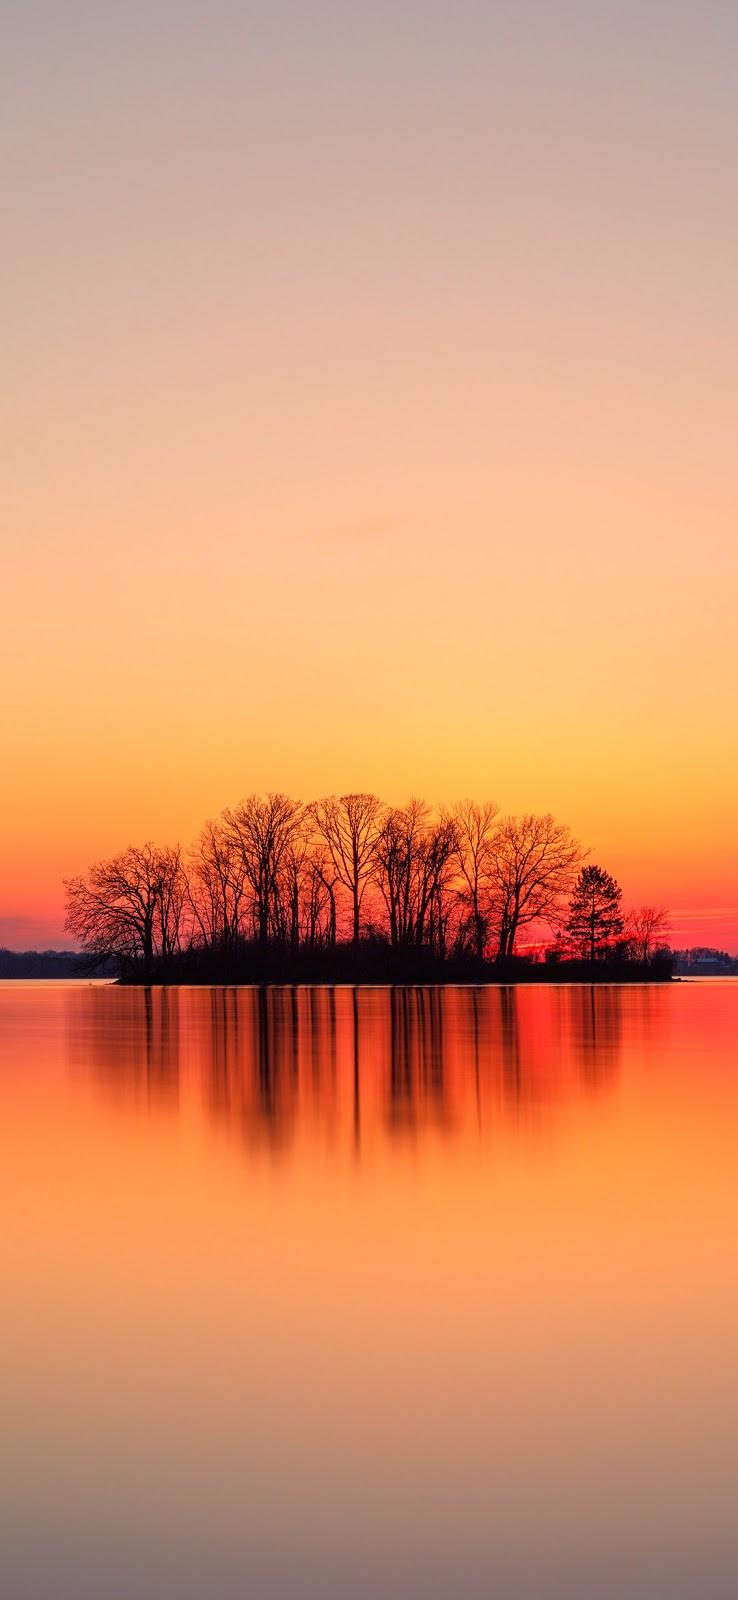 silhouette of trees near body of water wallpaper